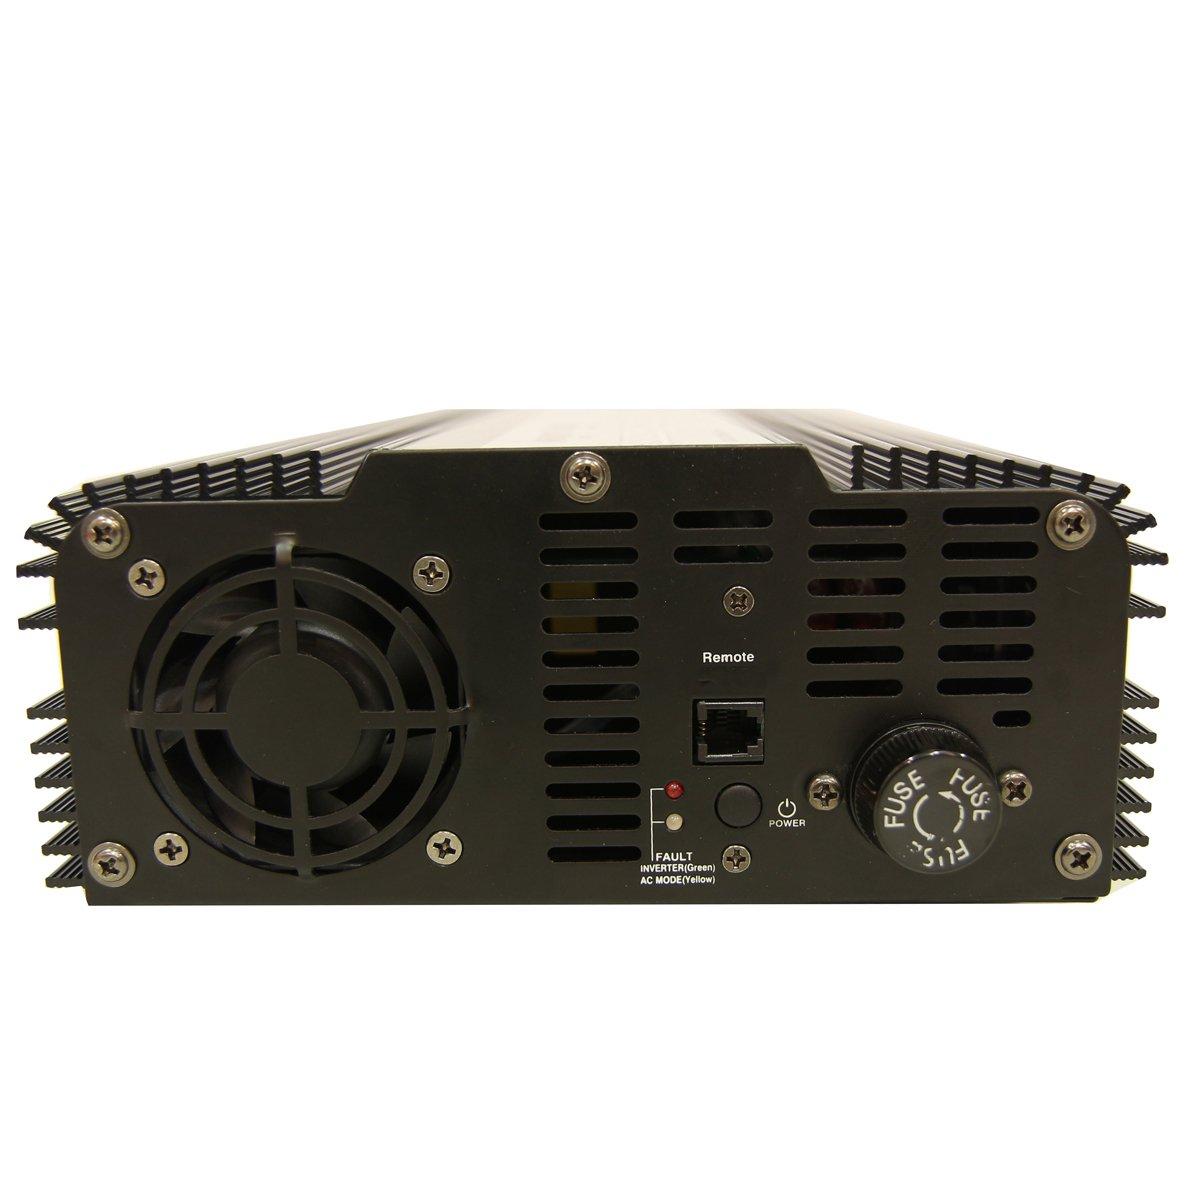 AIMS Power 1200 Watt Pure Sine Inverter w// 10 Amp Transfer Switch and 10 Power Cord PWRIX120012SC